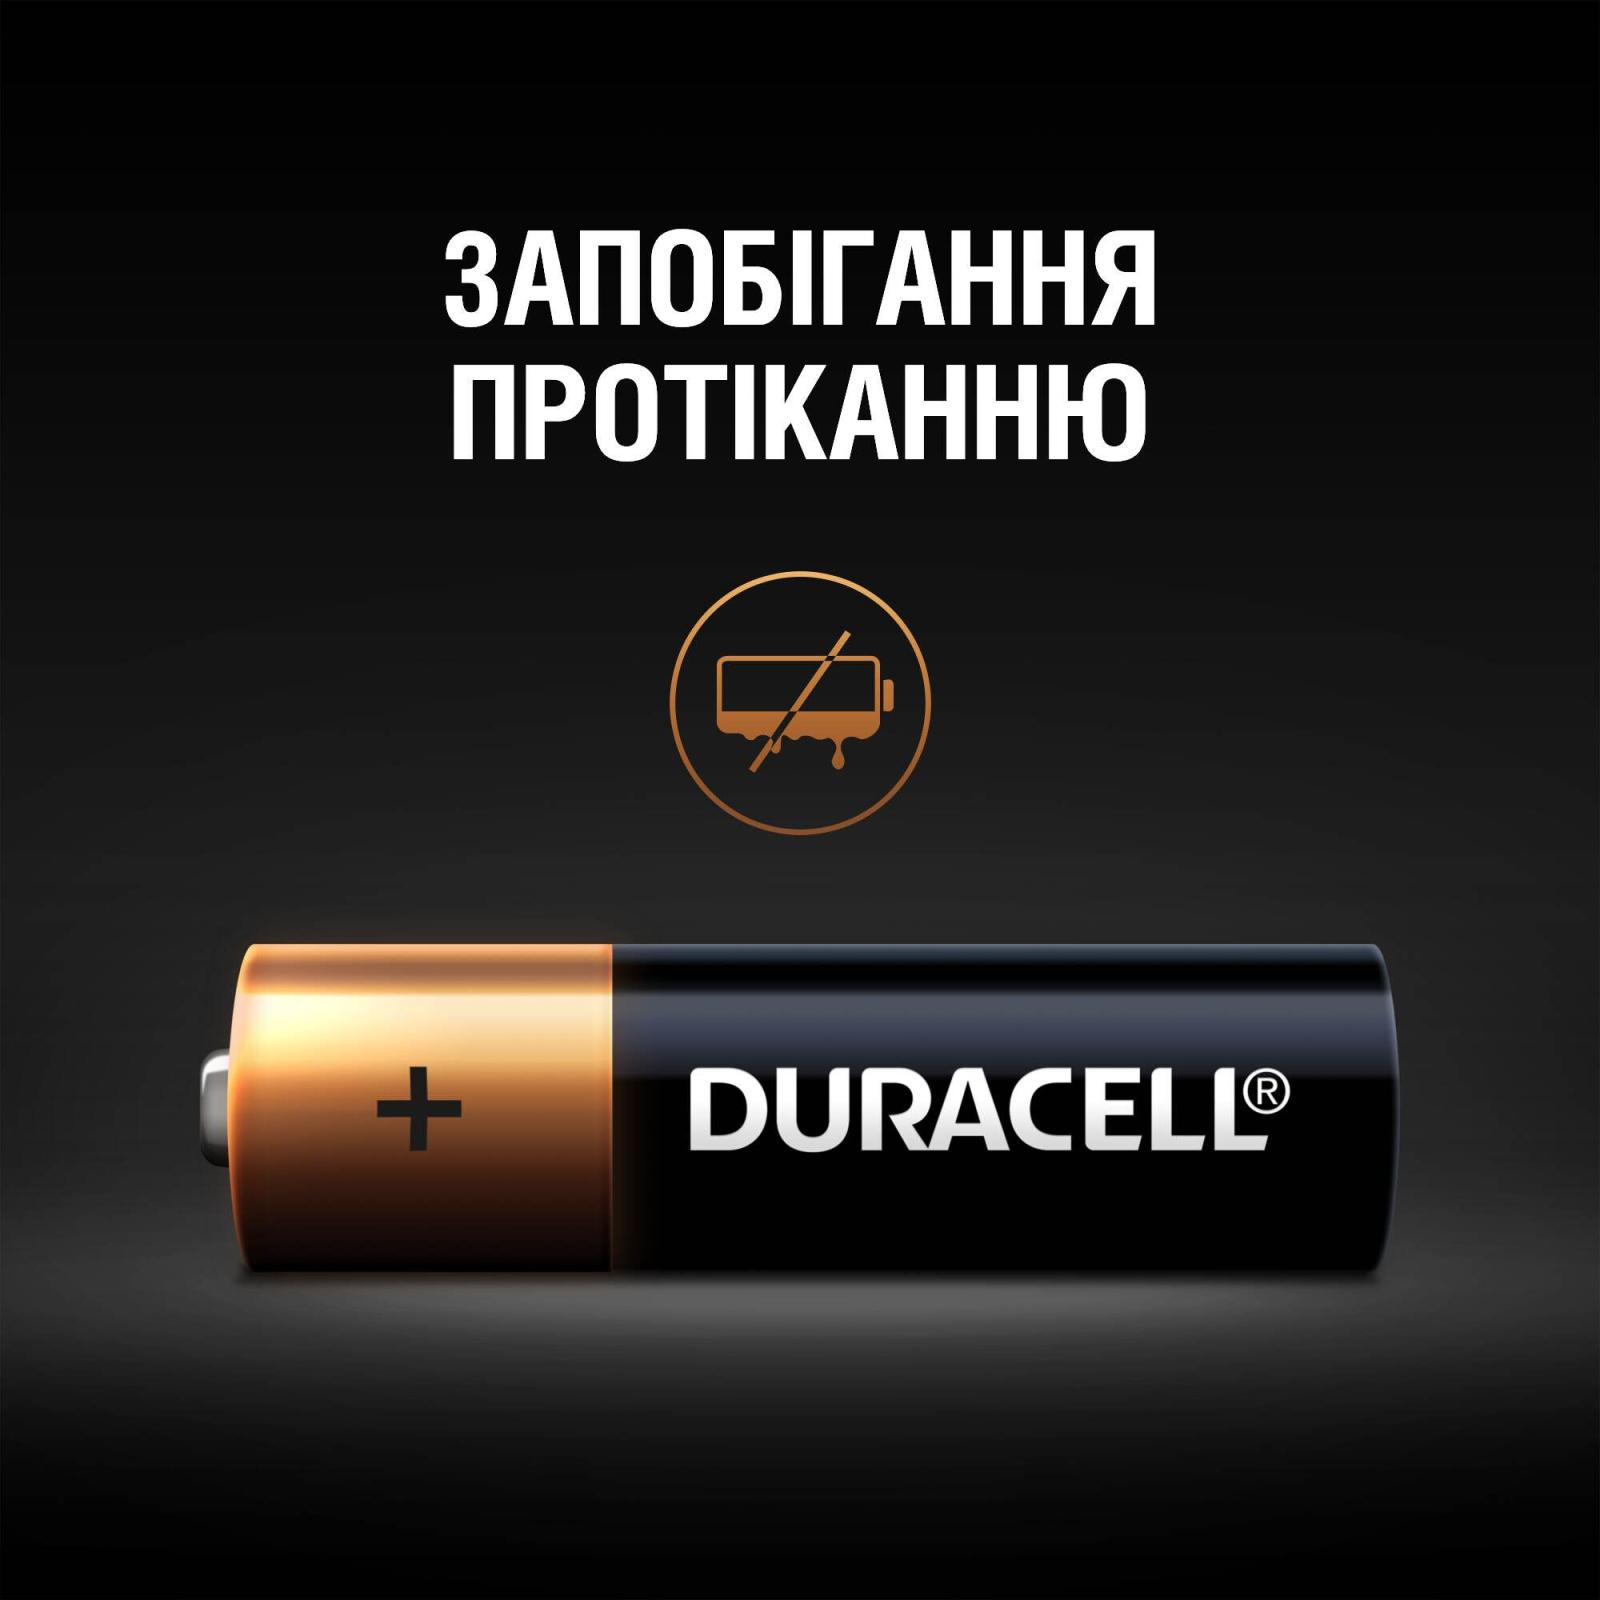 Батарейка Duracell AA MN1500 LR06 * 4 (5000394052536 / 81551270) изображение 6